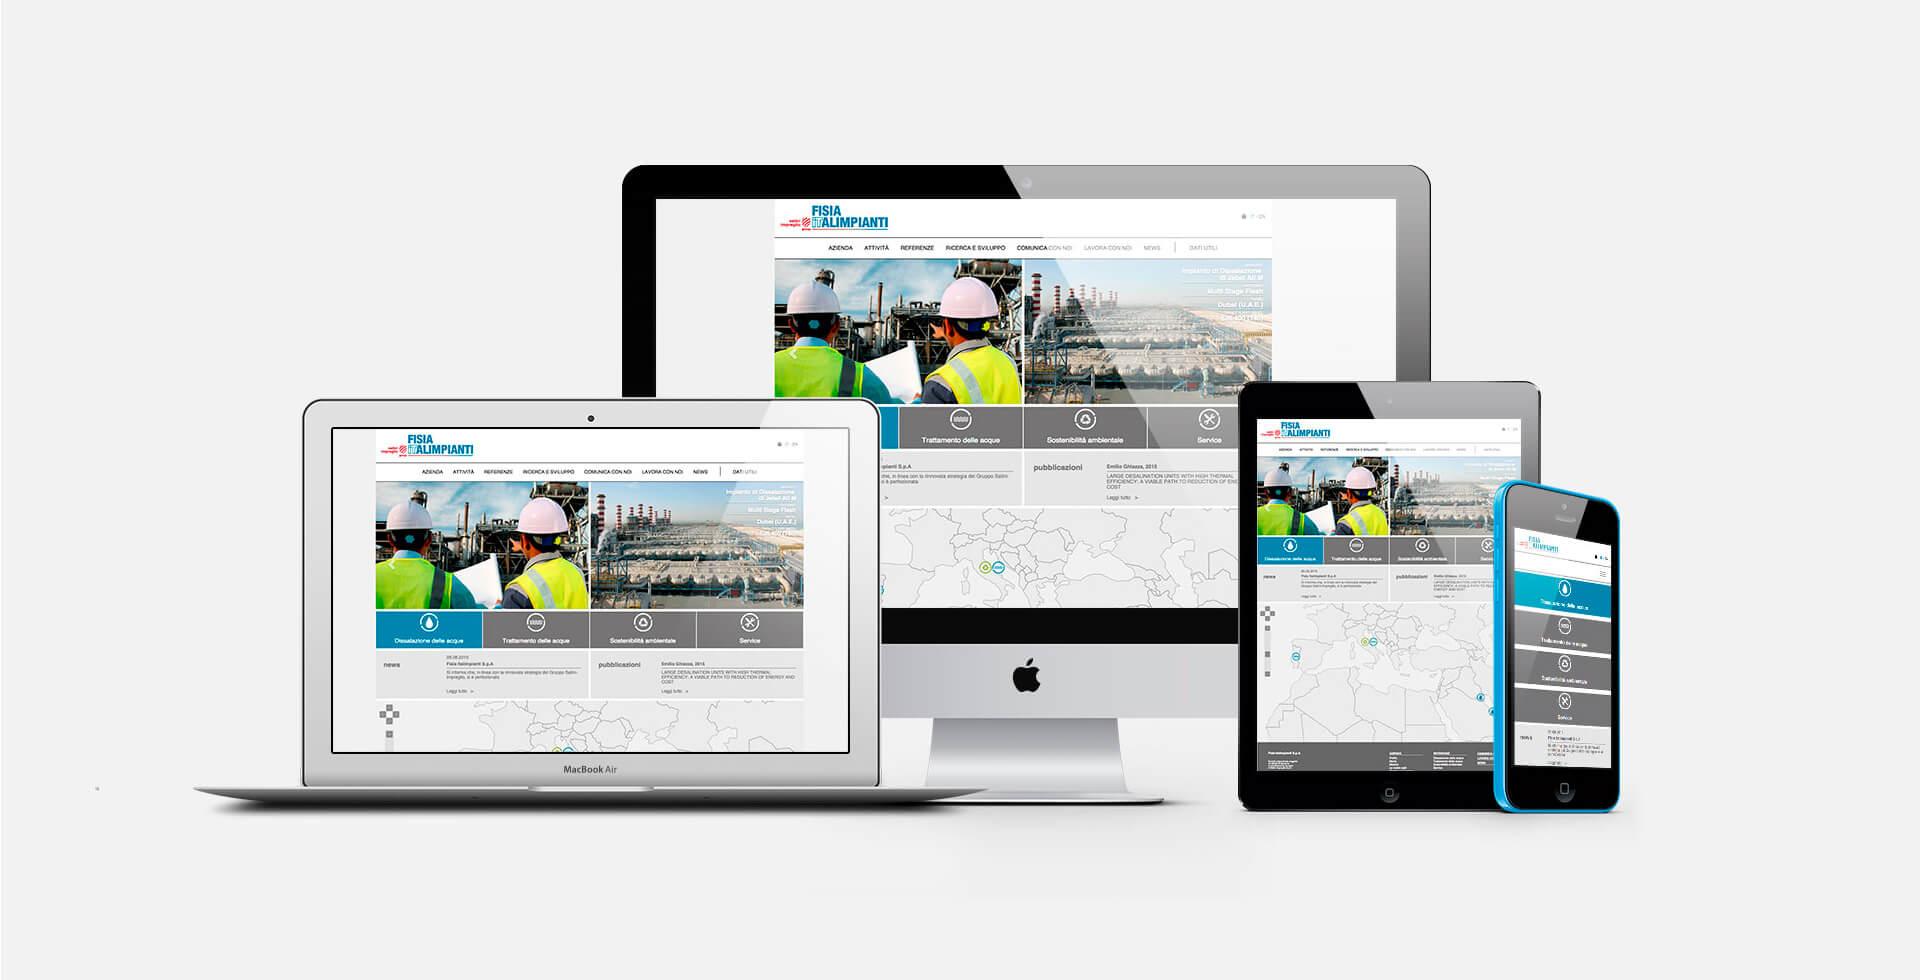 mintlab-webdesign-fisia-italimpianti-01